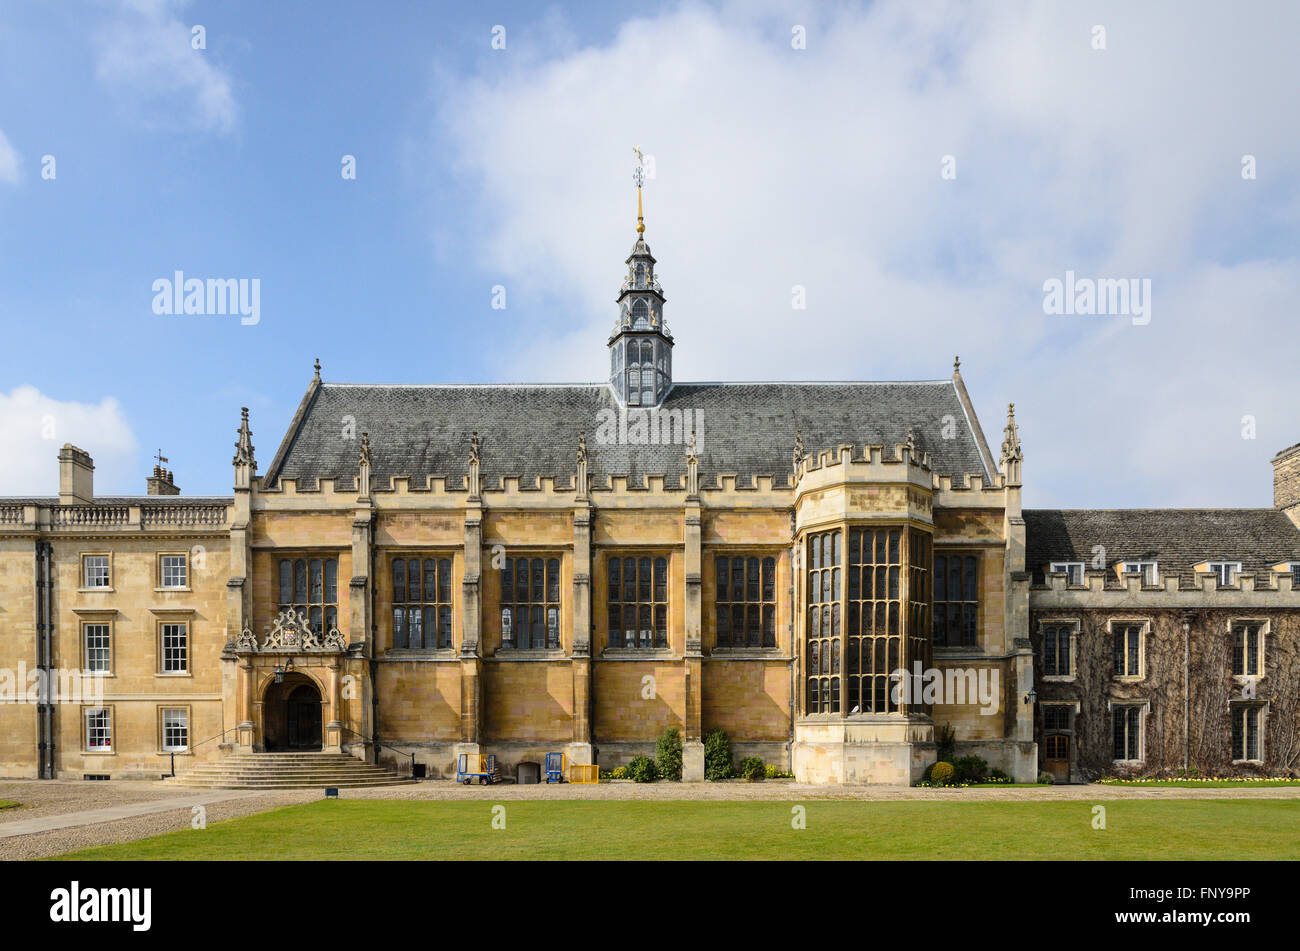 Trinity College, University of Cambridge, Cambridge, England, UK. Stock Photo